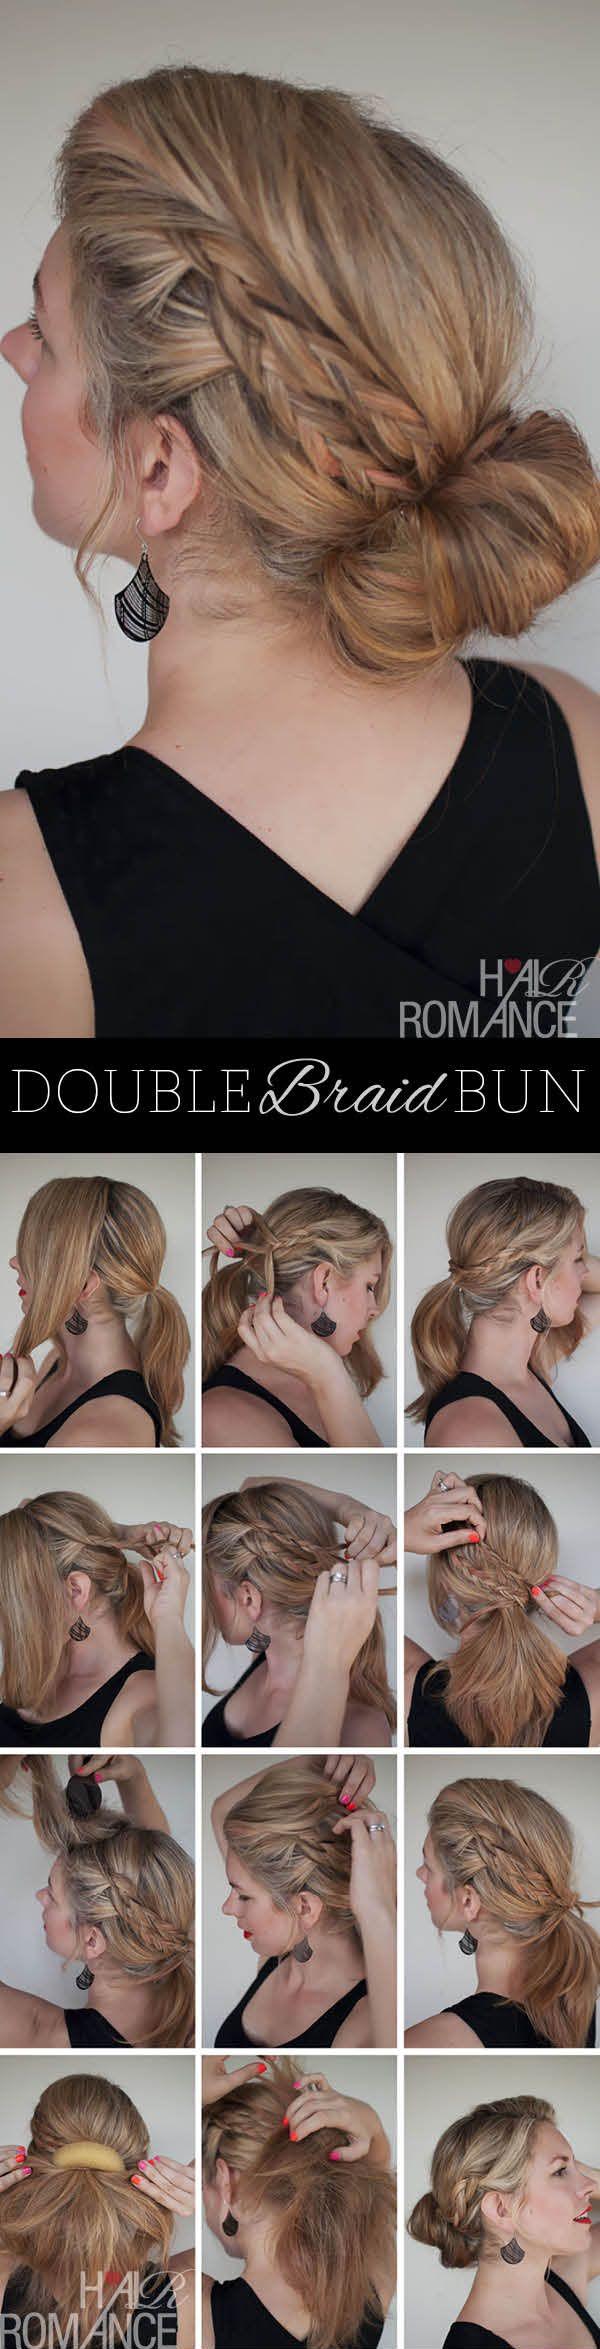 Hair Romance - the double braid bun hairstyle tutorial